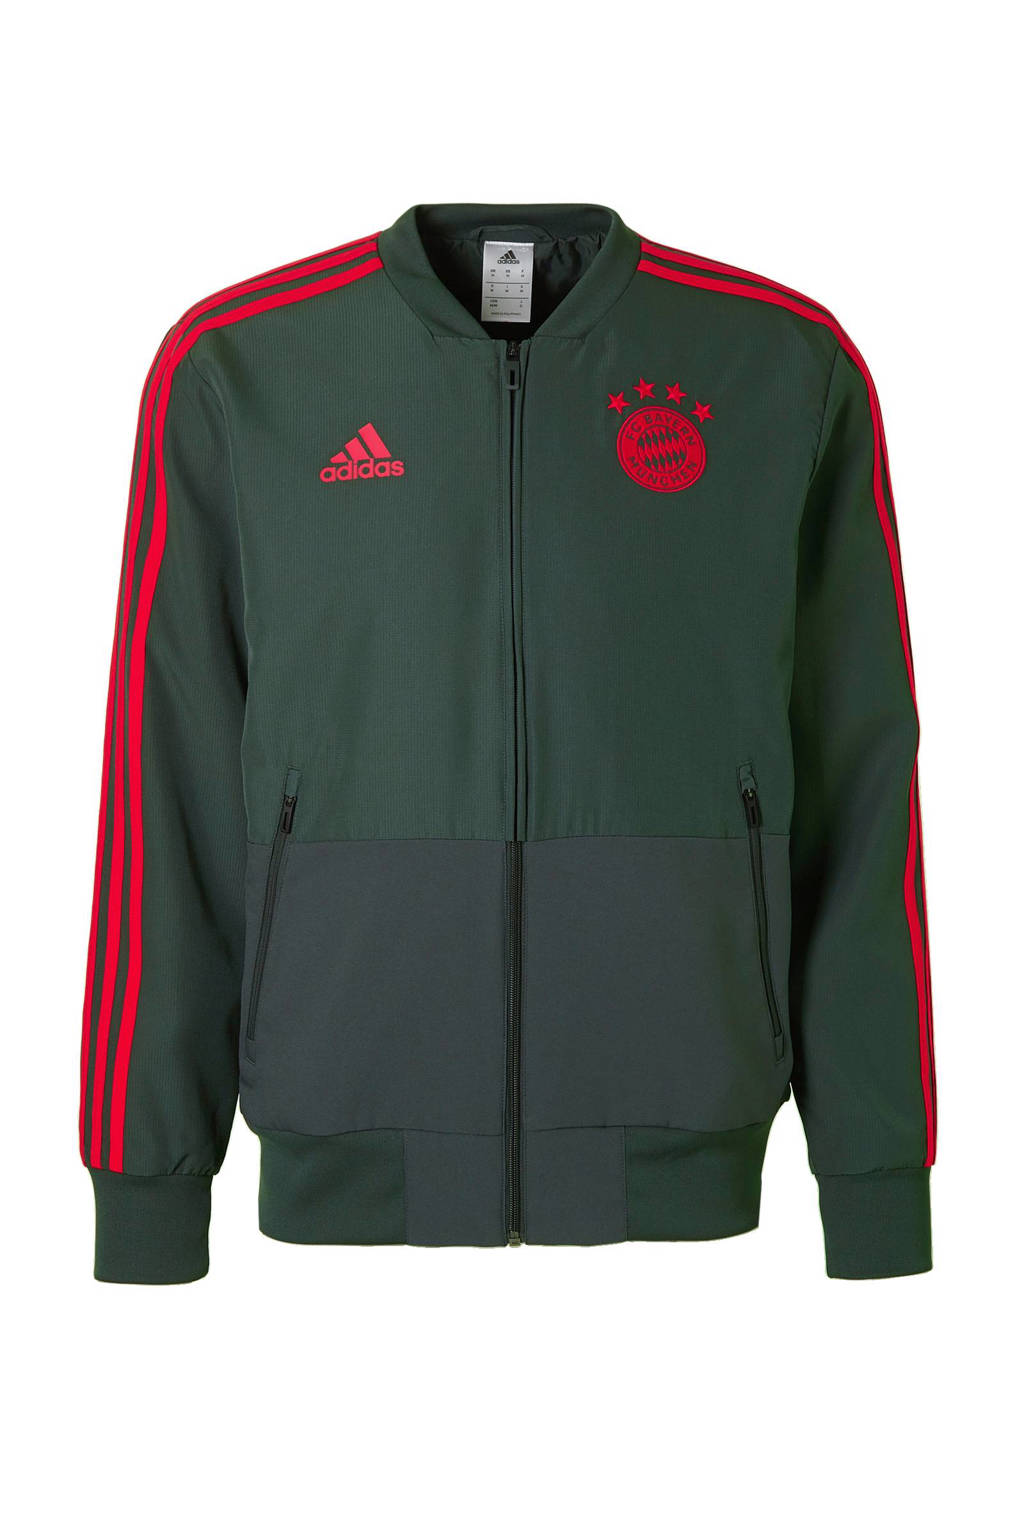 8d4f3964cbf adidas performance Senior FC Bayern München sportjack, Donkergroen/ rood